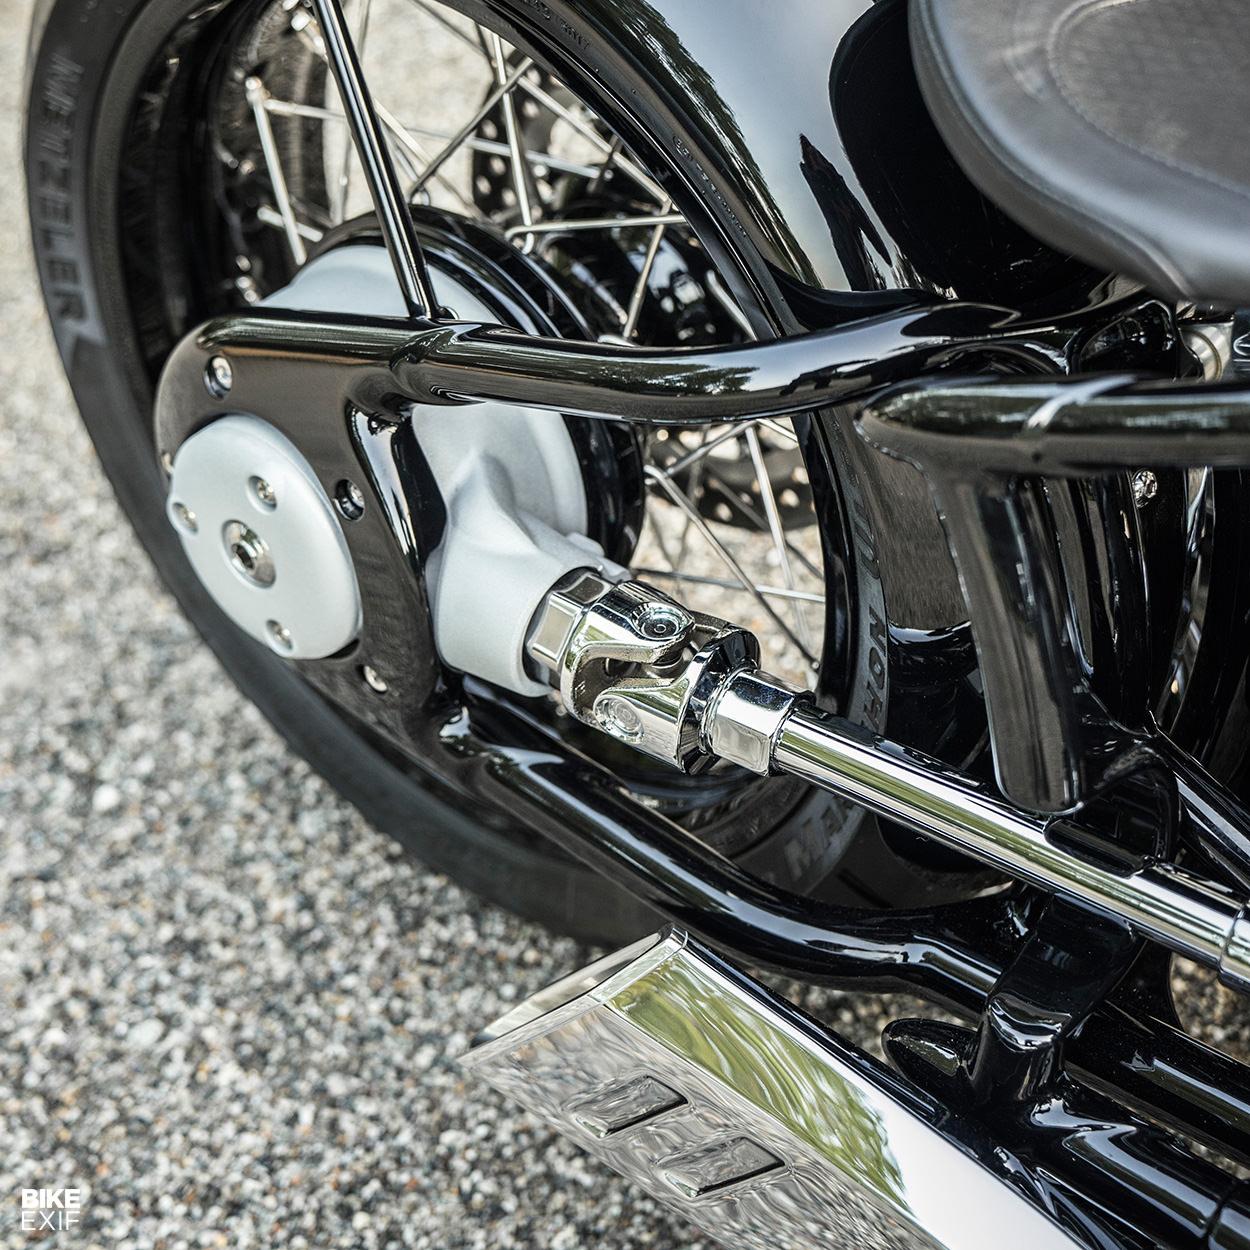 The BMW Concept R18 motorcycle, star of the 2019 Concorso d'Eleganza at Villa d'Este